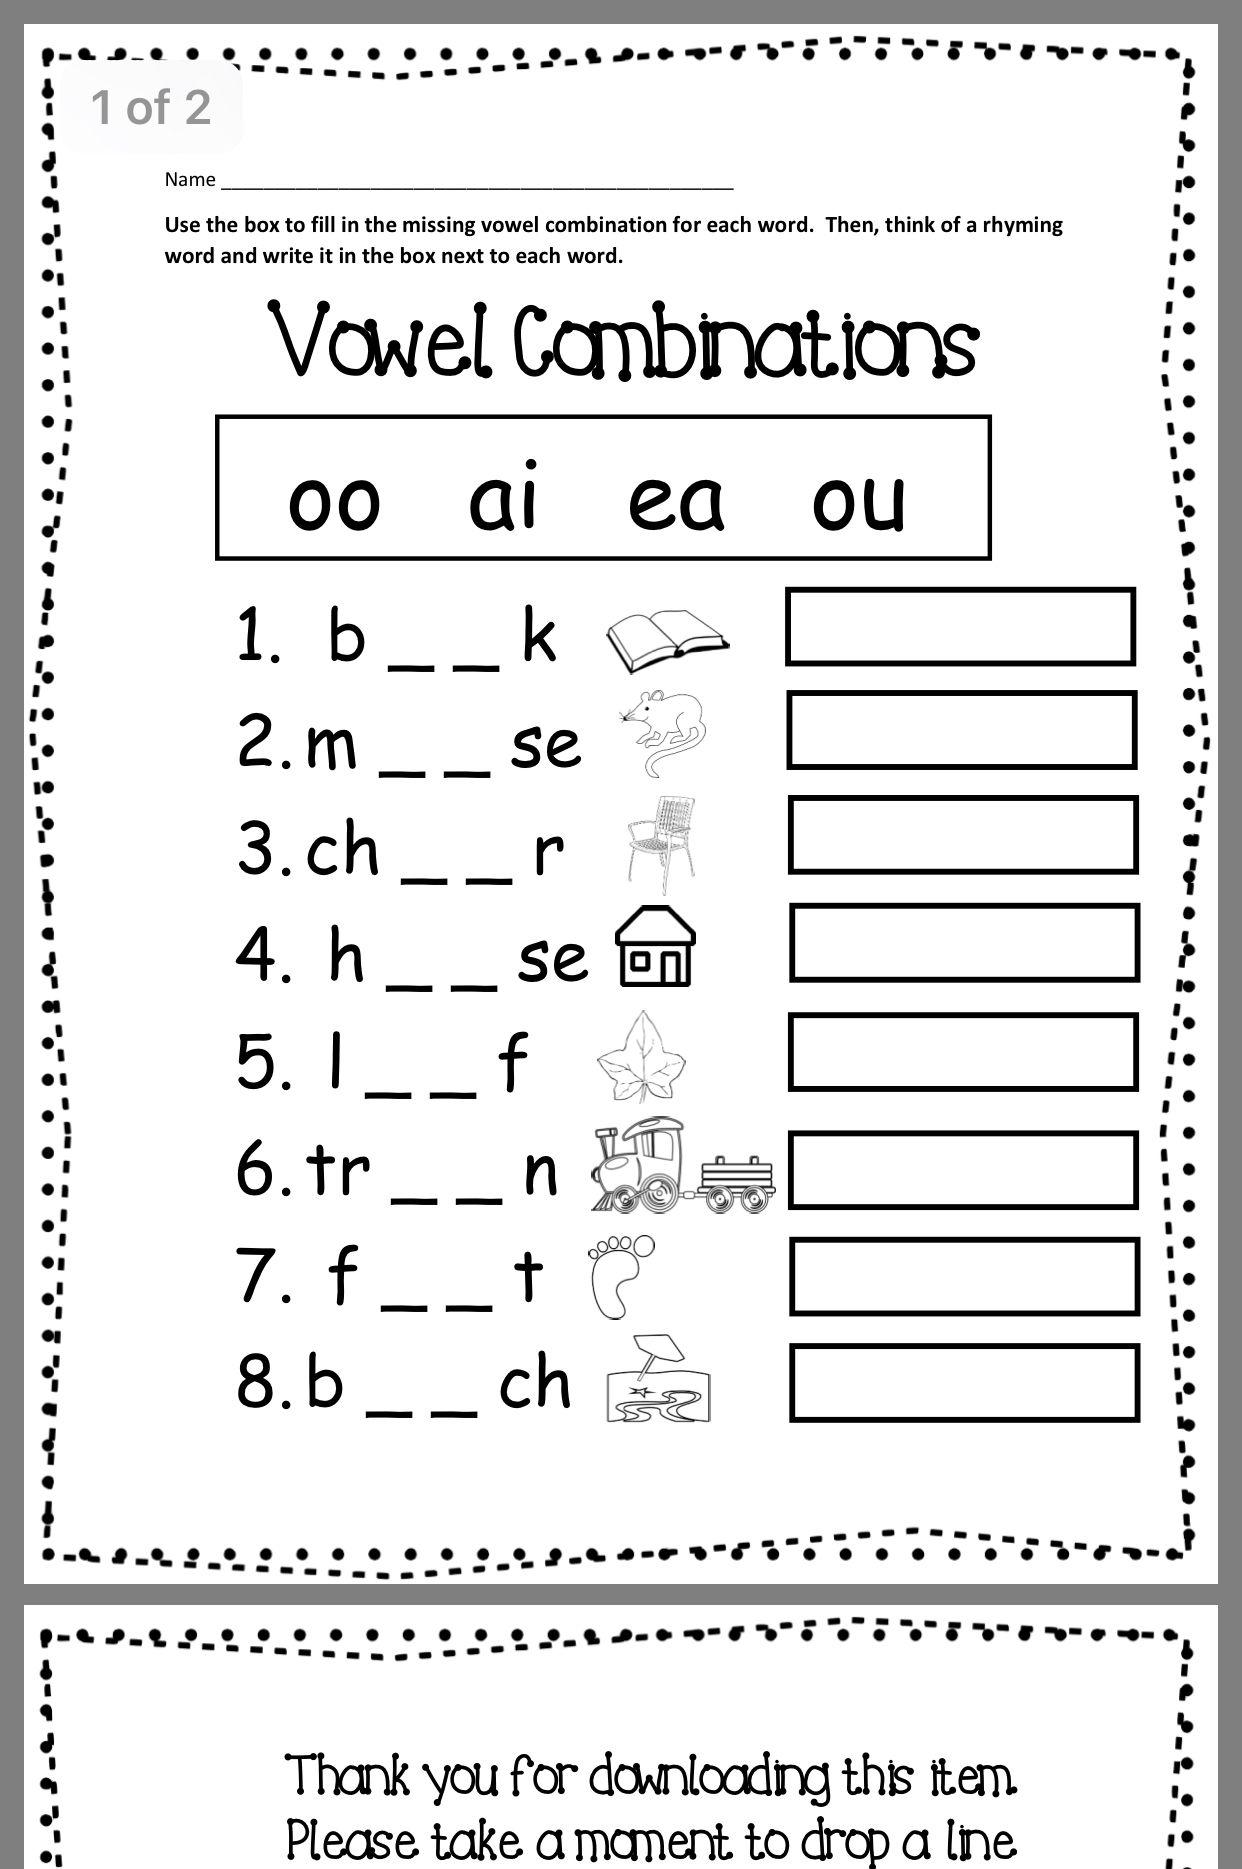 Pin By Byanka Owen Rodriguez On Education Phonics Worksheets Free Phonics Worksheets 2nd Grade Worksheets